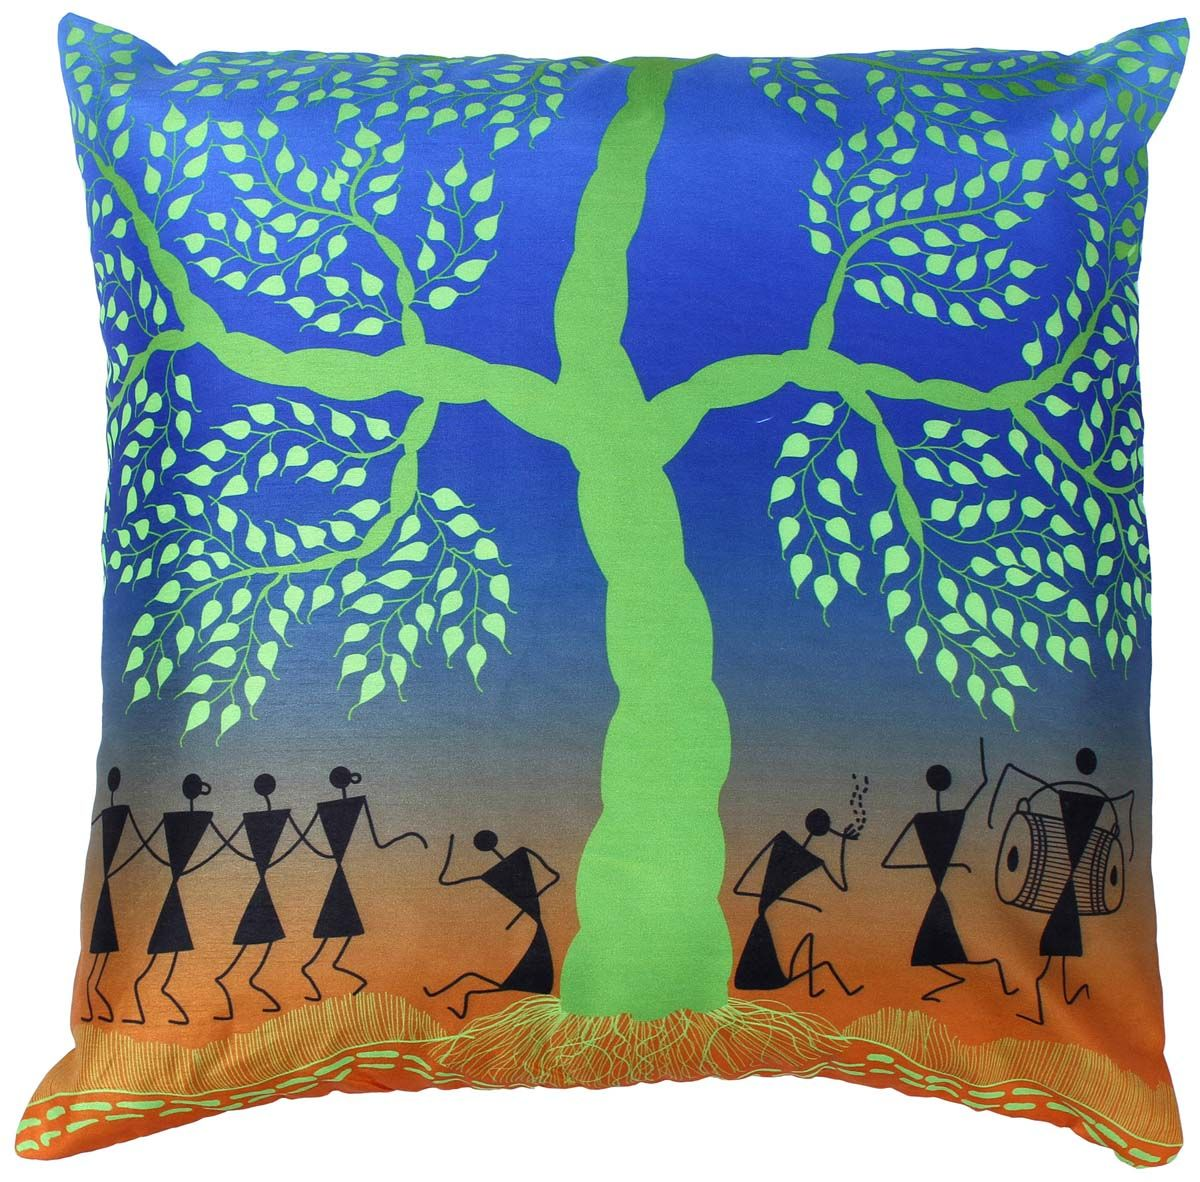 "Wholesale Tree of Life 16 x 16"" Cushion Cover - Decorative ..."